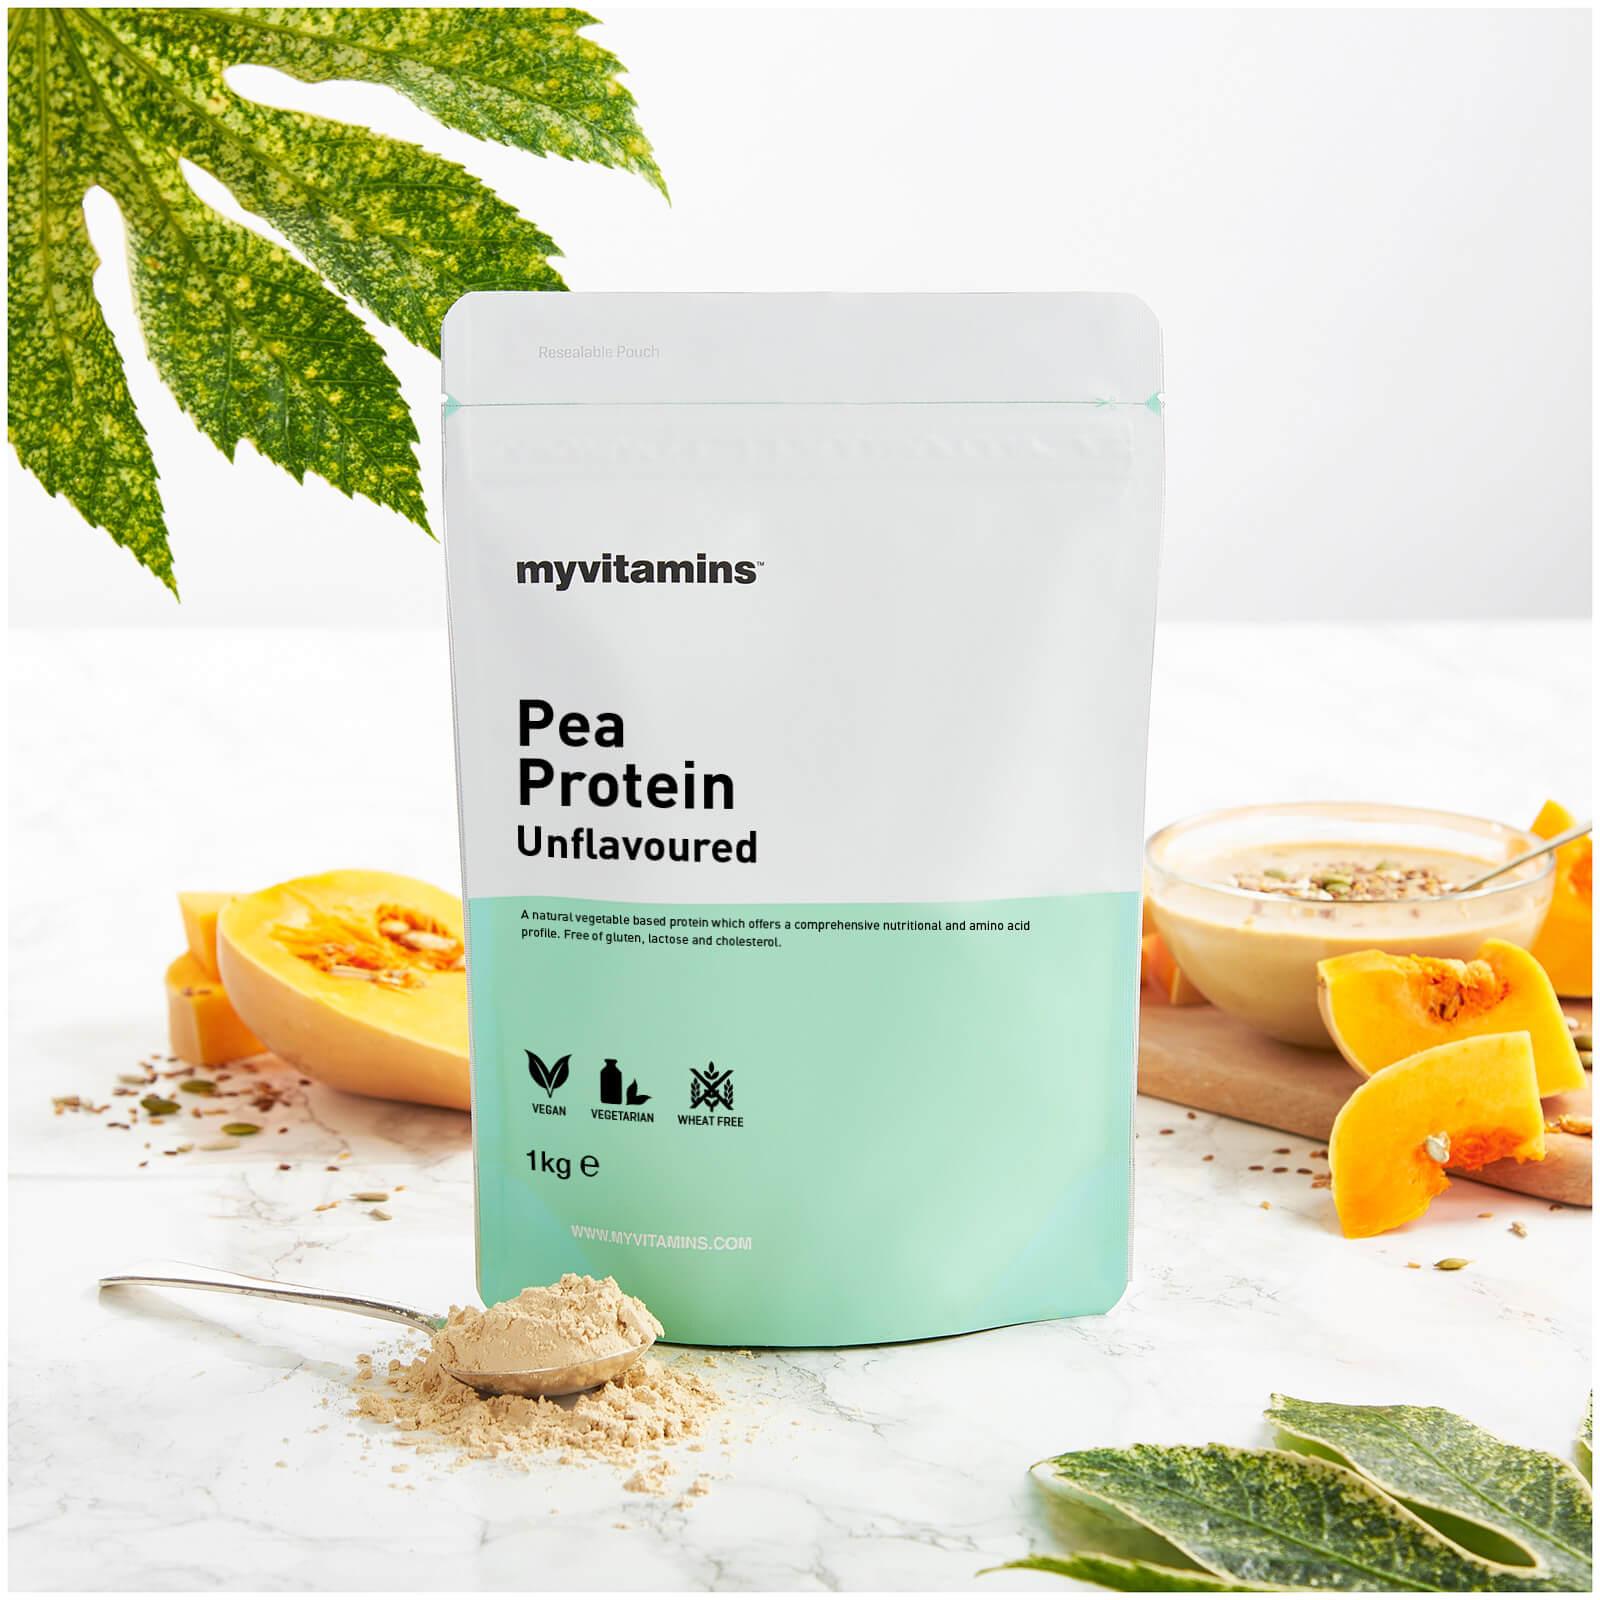 MyVitamins - Pea Protein Isolate (1KG) - 11271997 1614423443164619